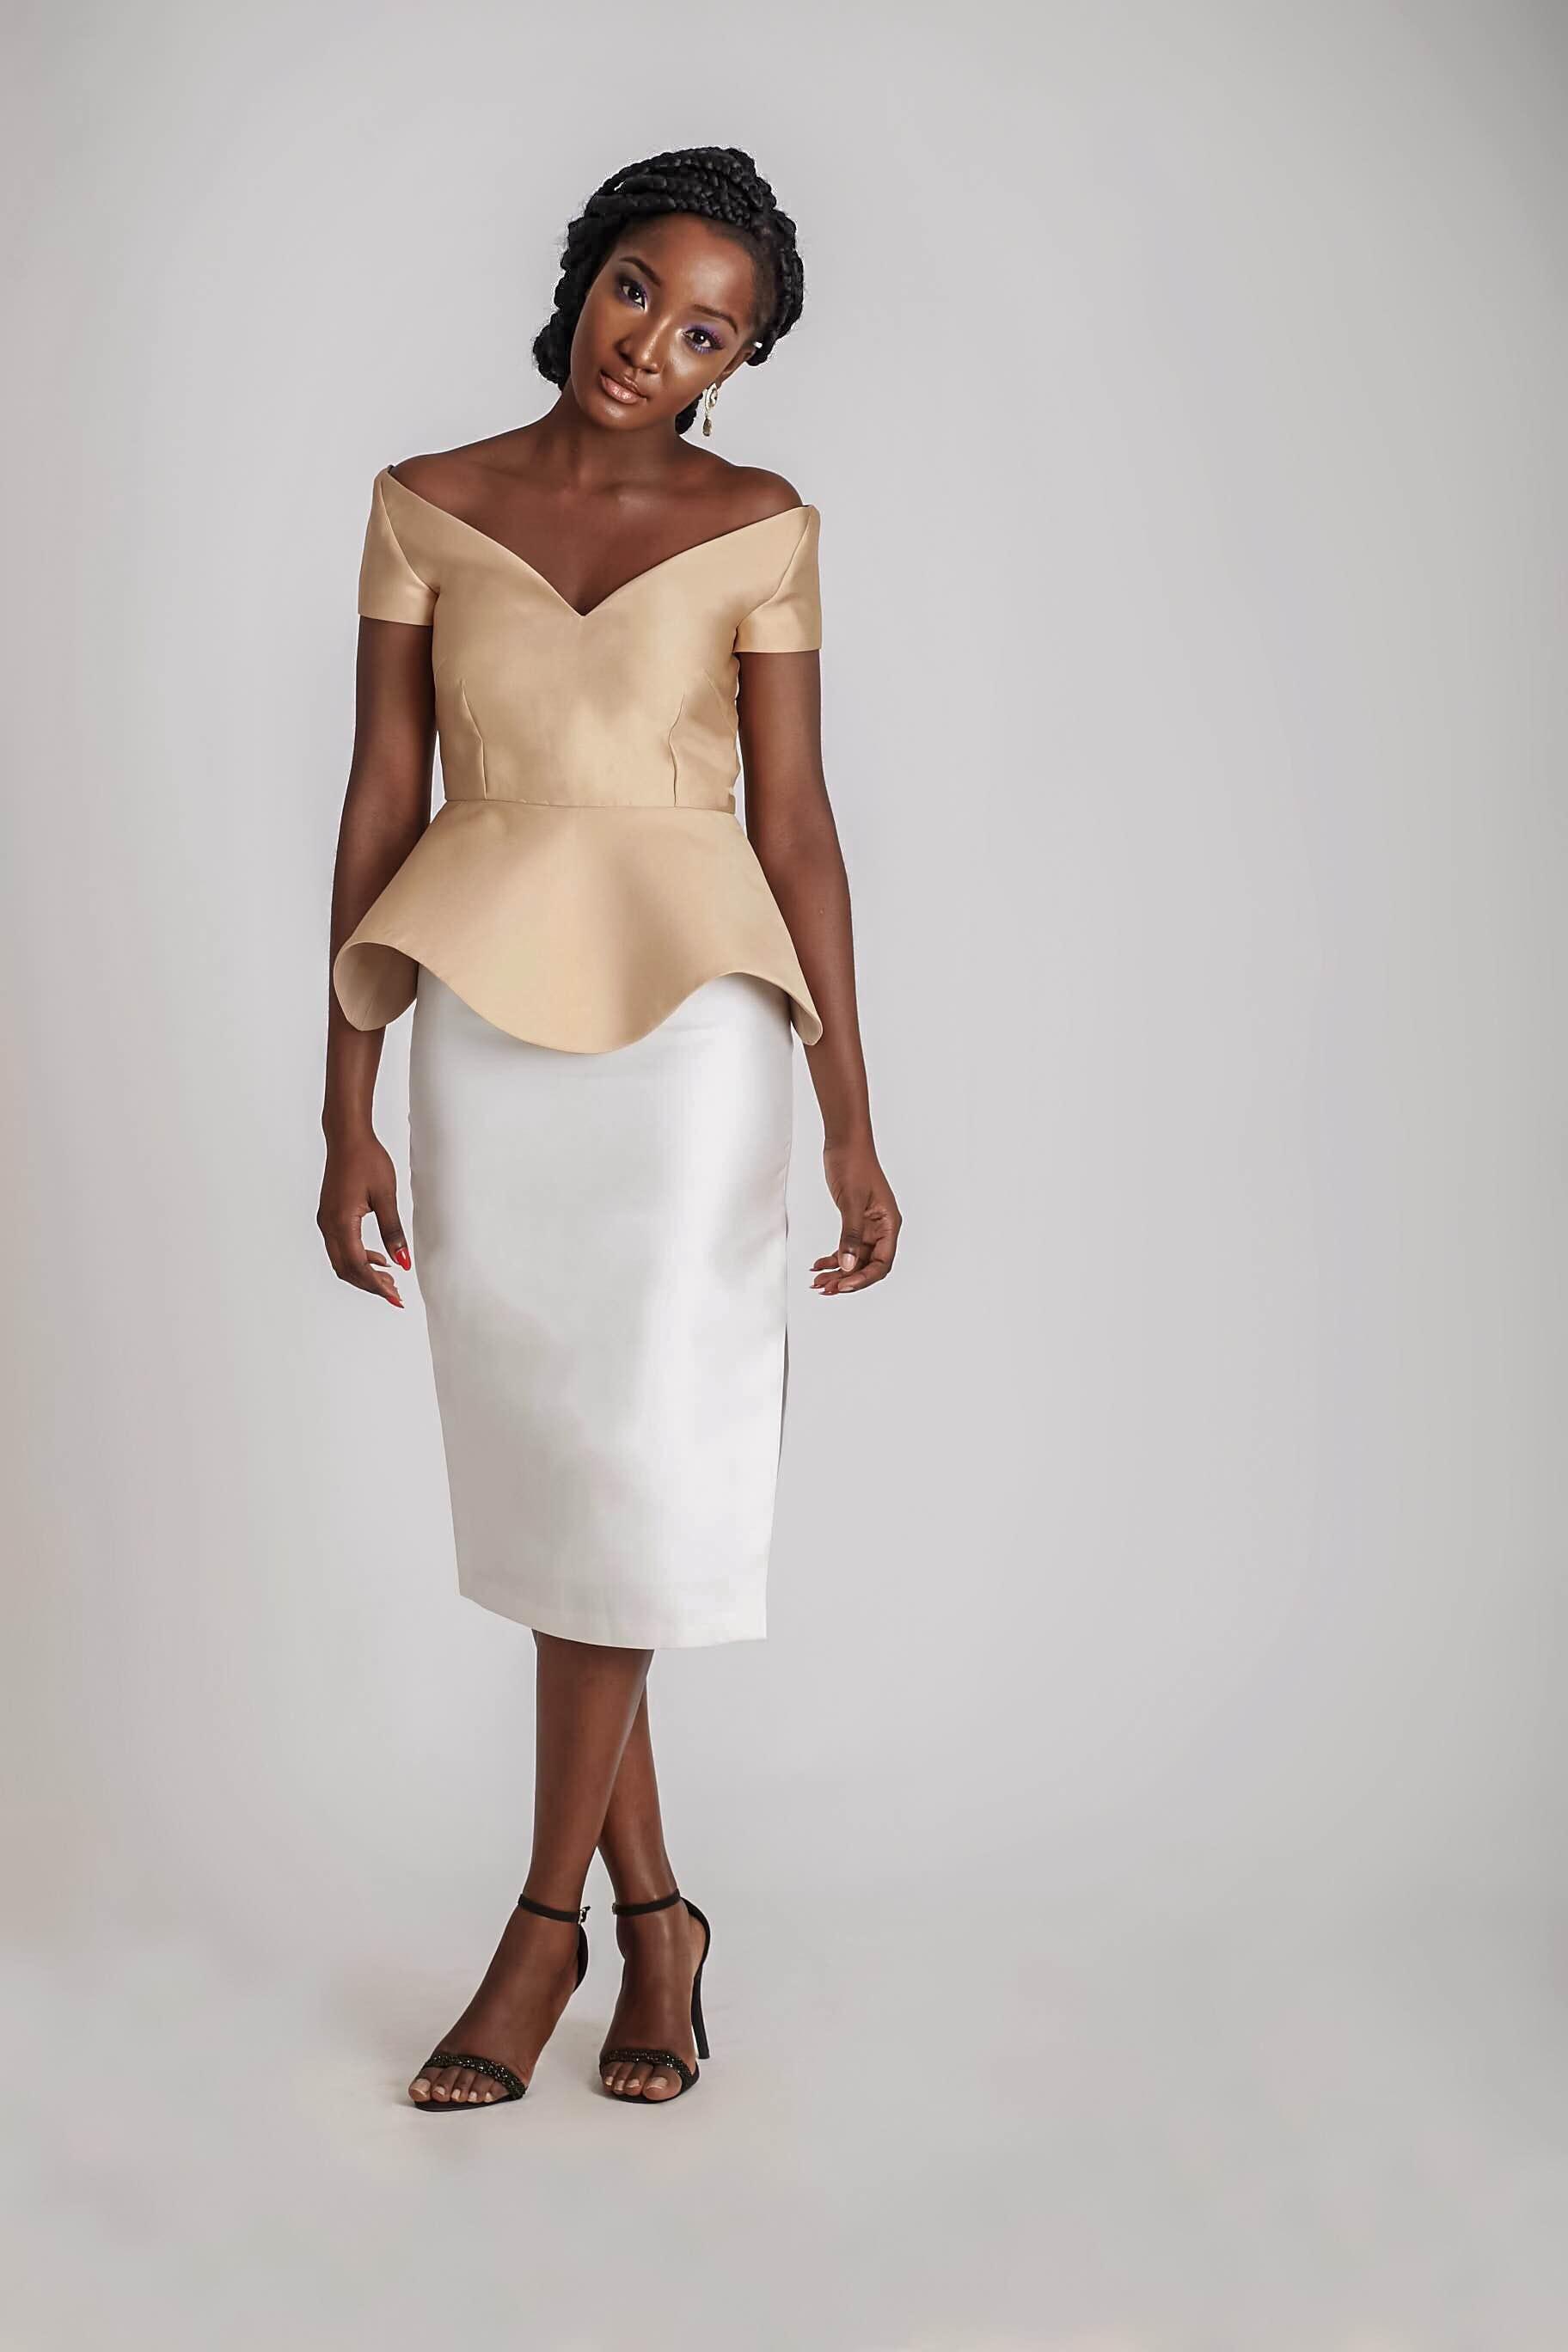 Imad Eduso - BN Style - Collection Lookbook - BellaNaija.com 016